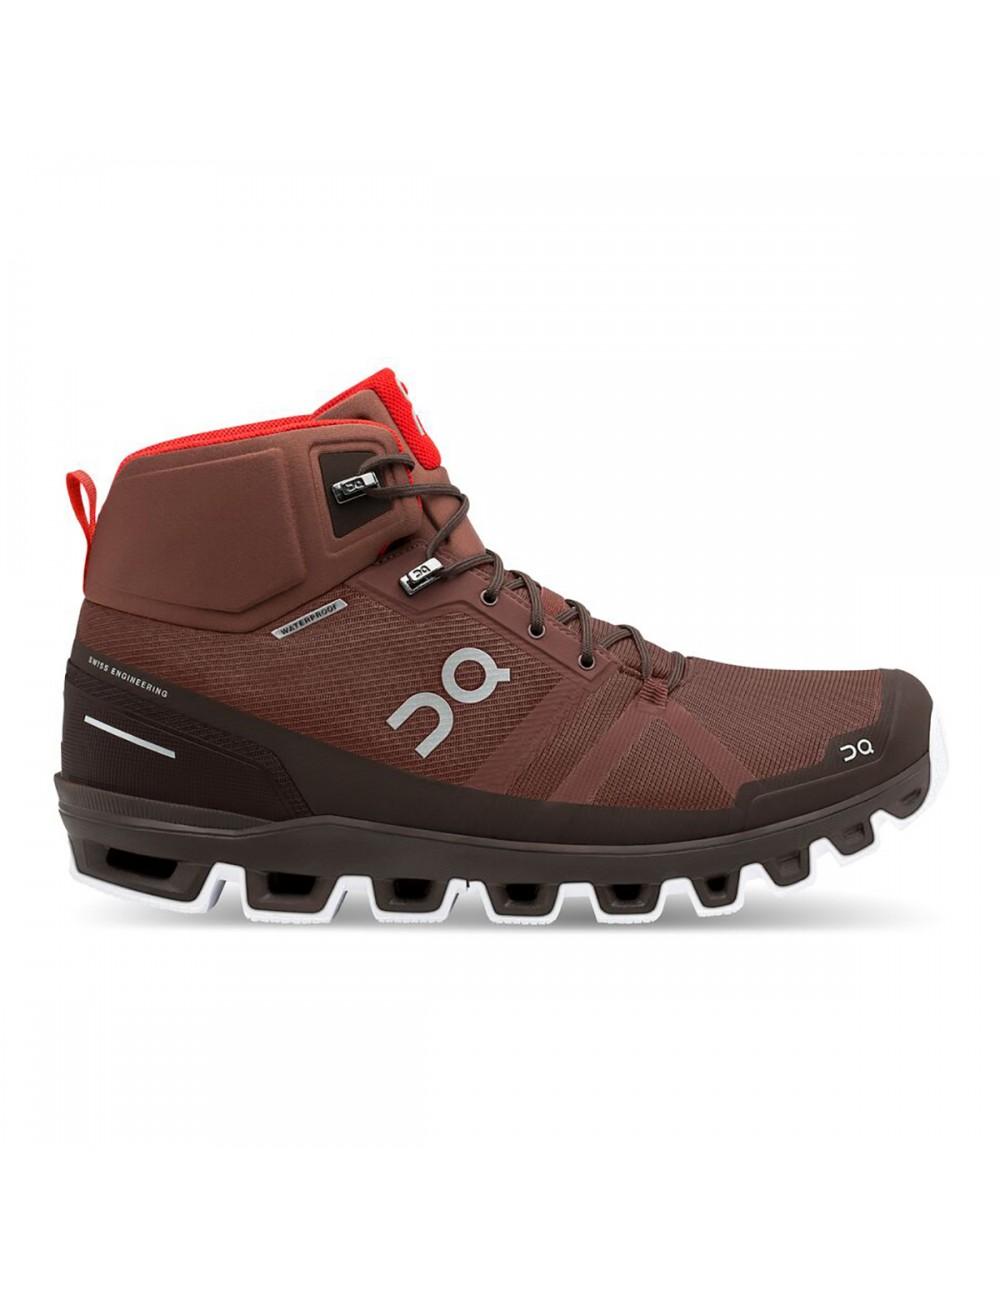 ON Cloudrock Waterproof Shoe - Cocoa/Red_12665